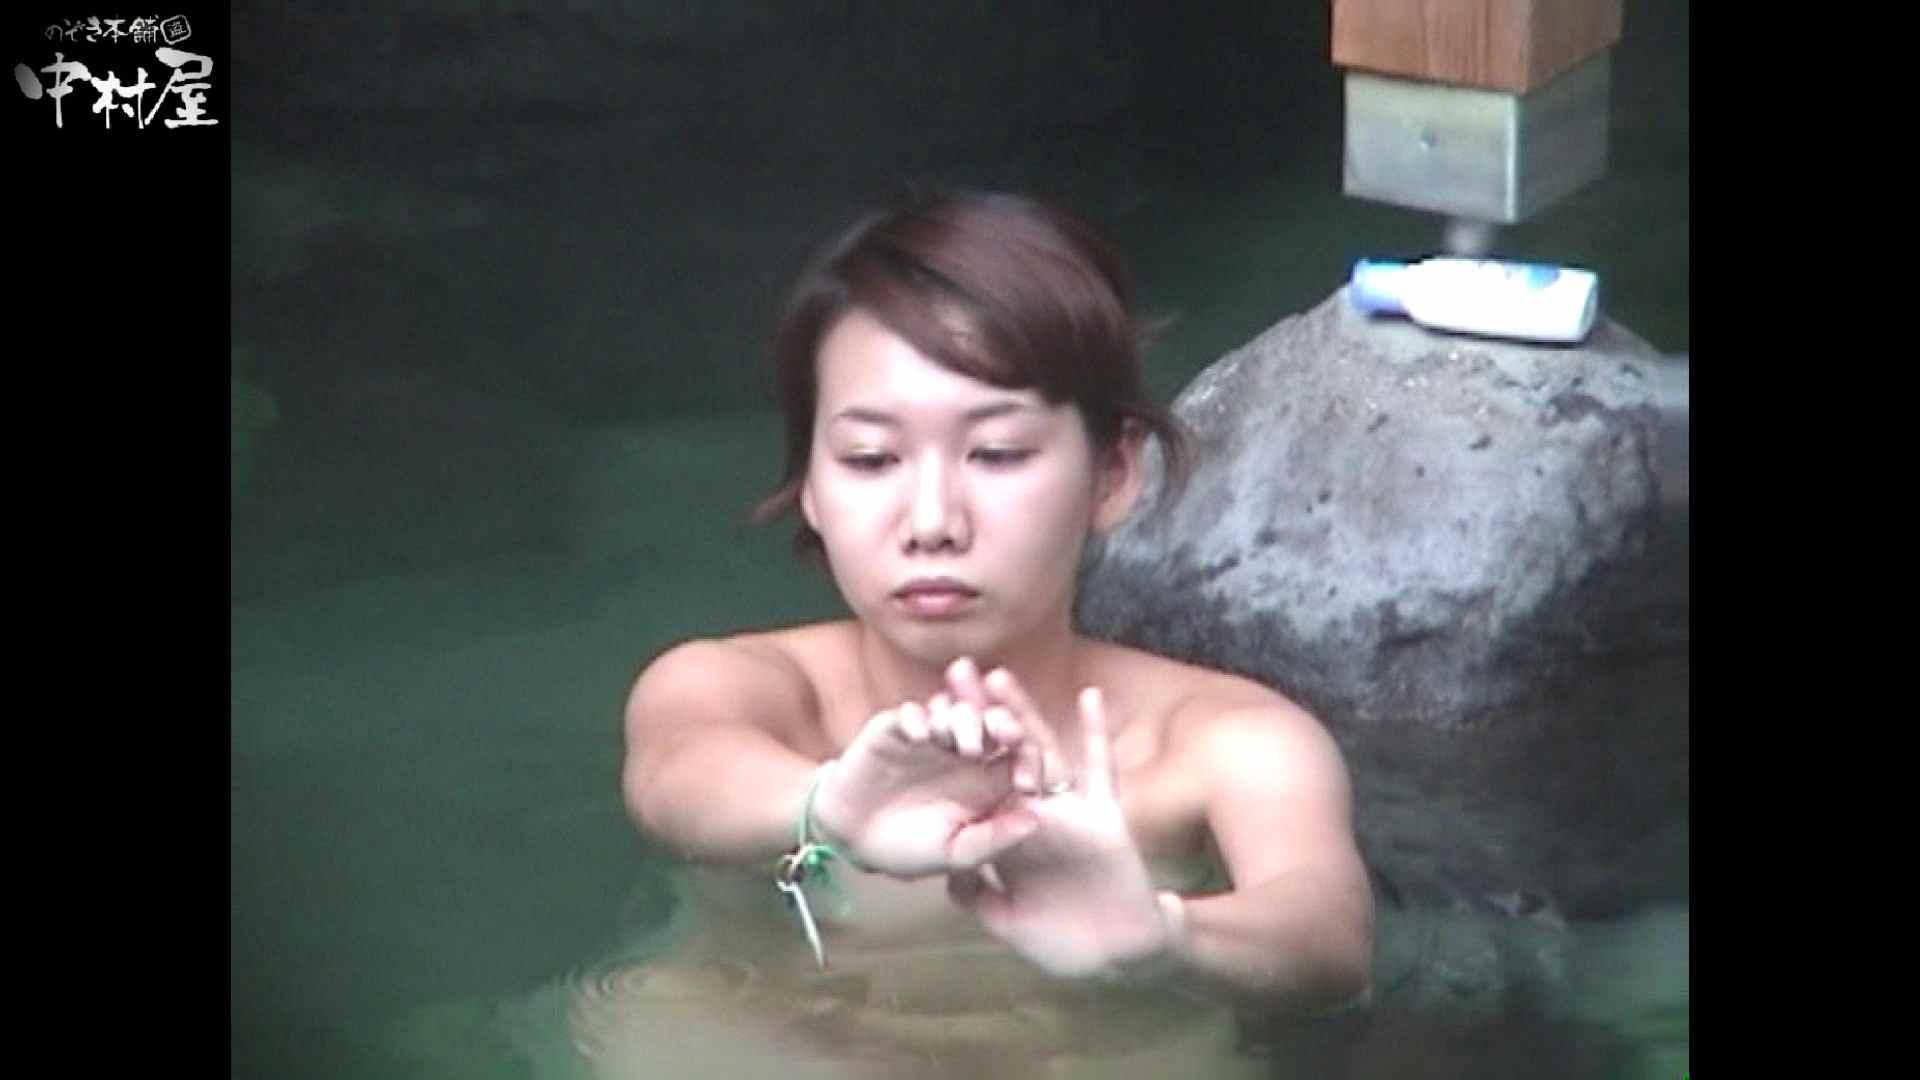 Aquaな露天風呂Vol.951 盗撮映像  93Pix 26